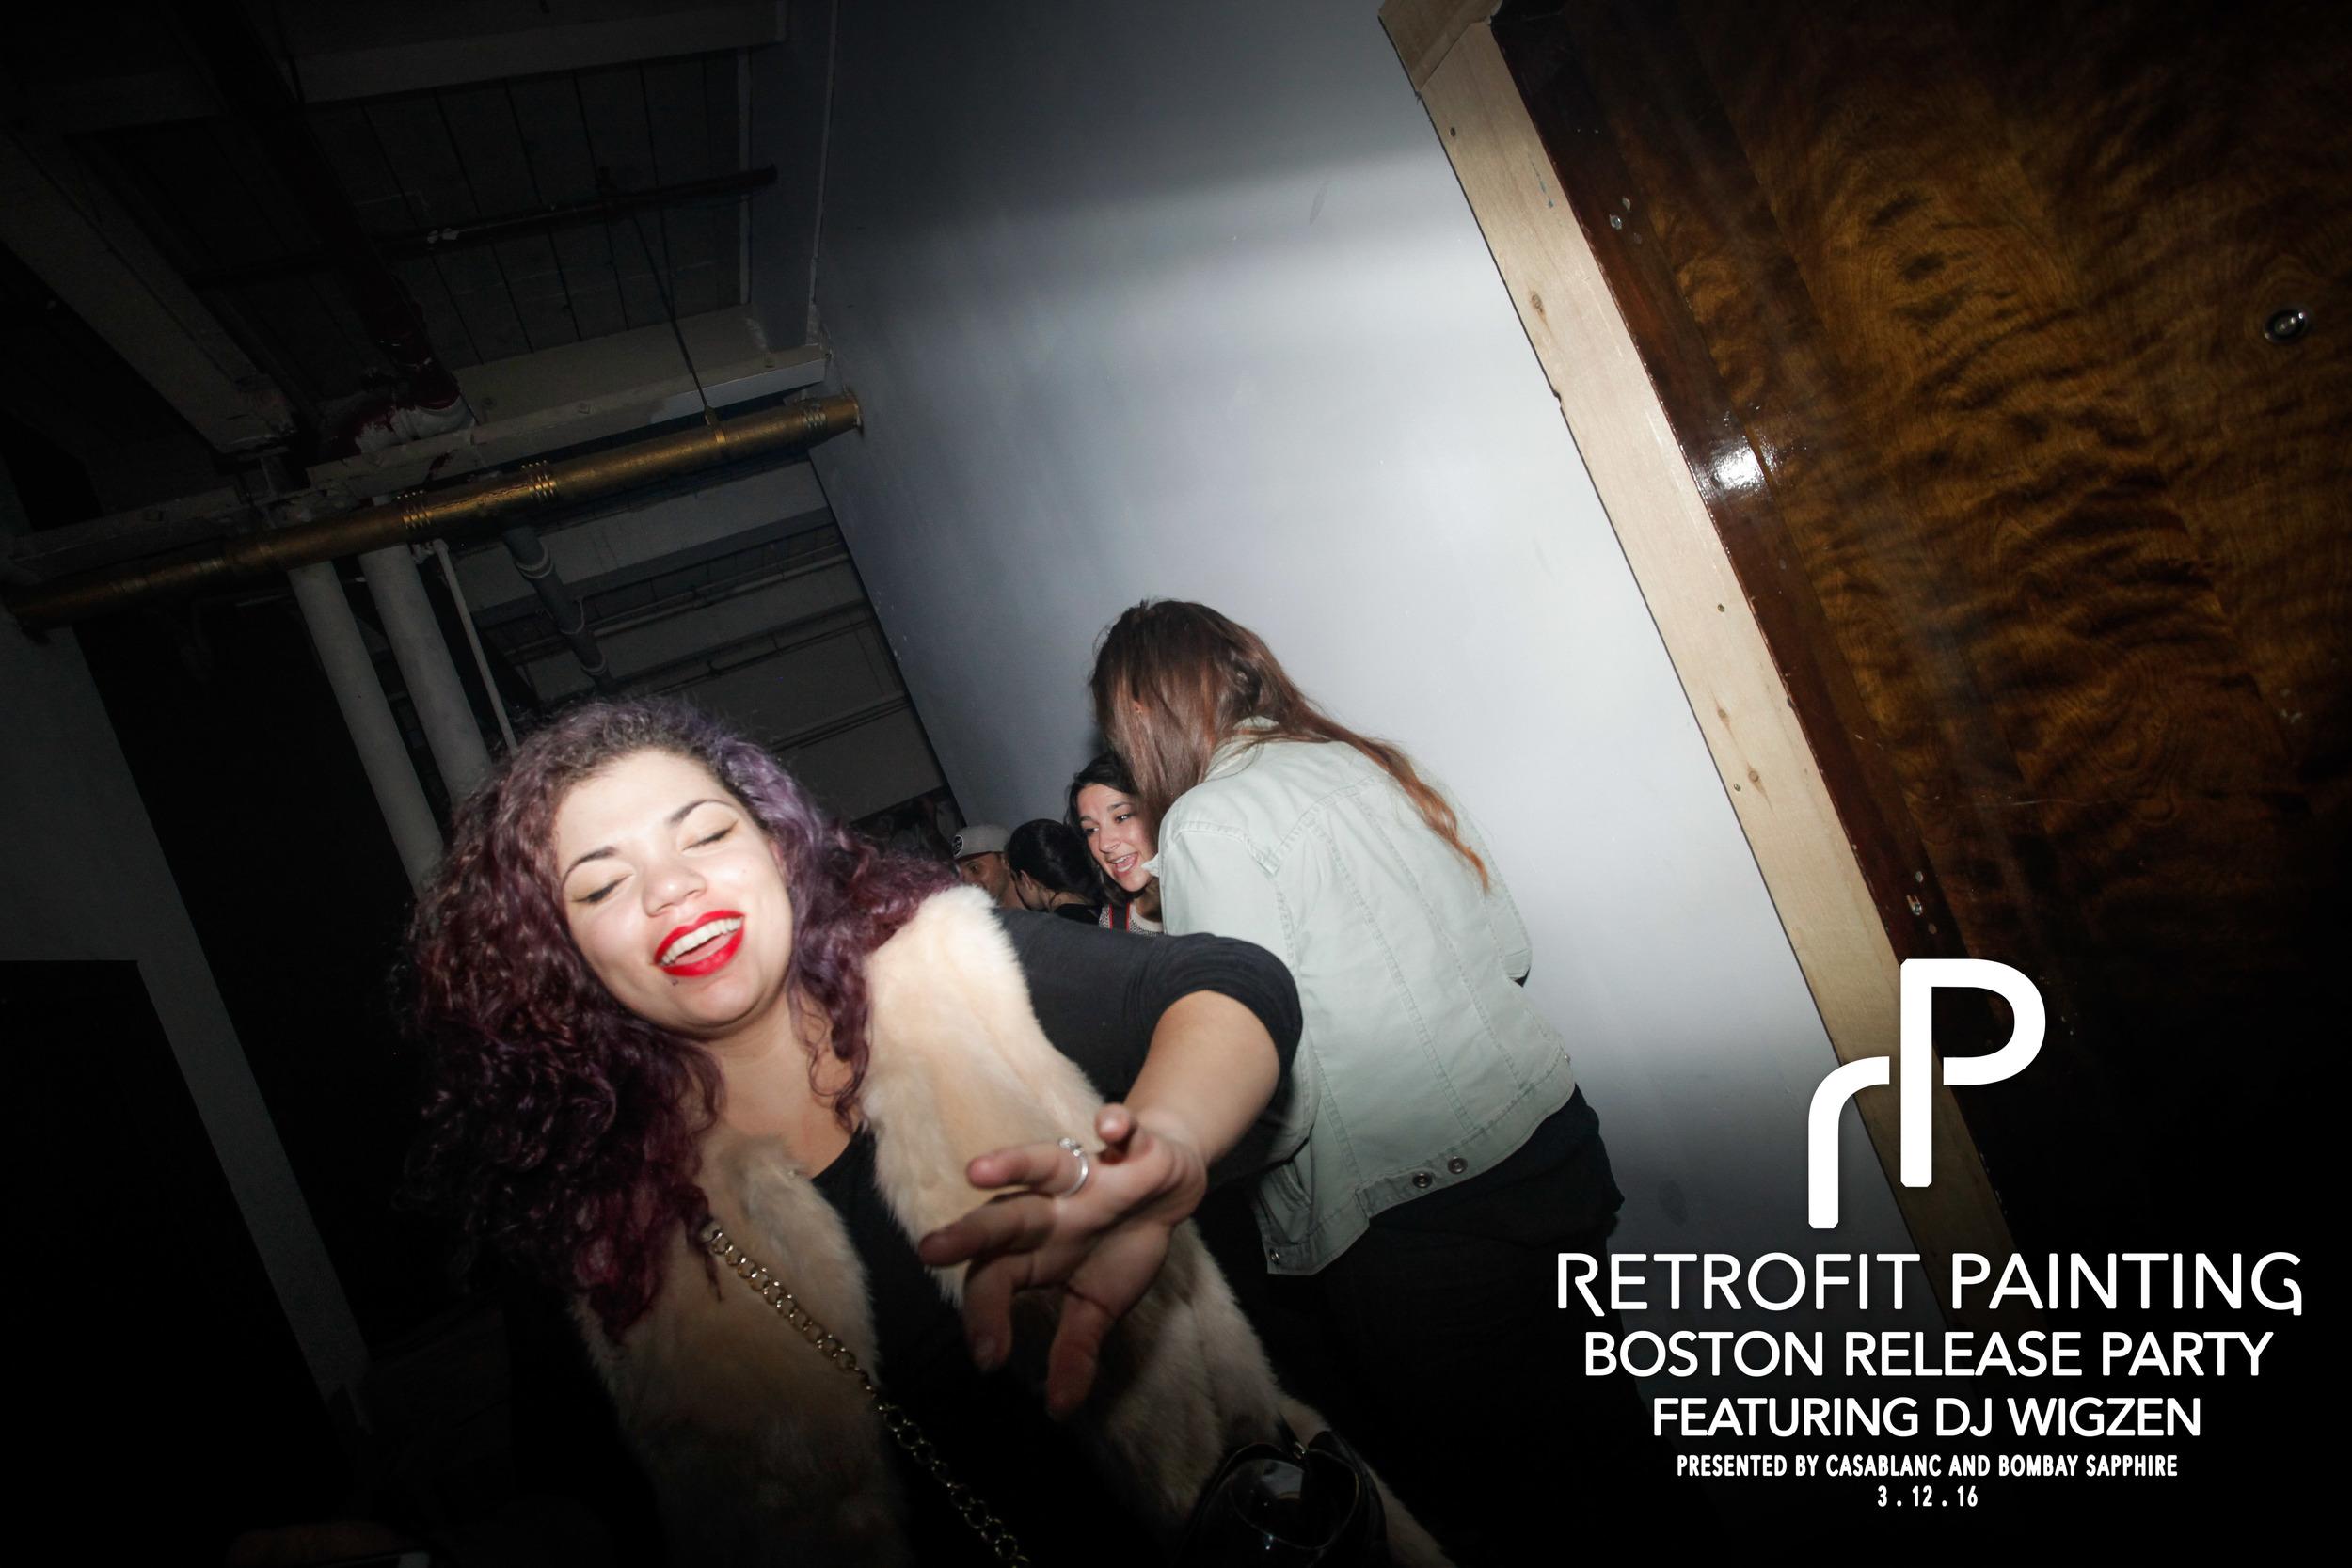 Retrofit Painting Boston Release Party 0139.jpg